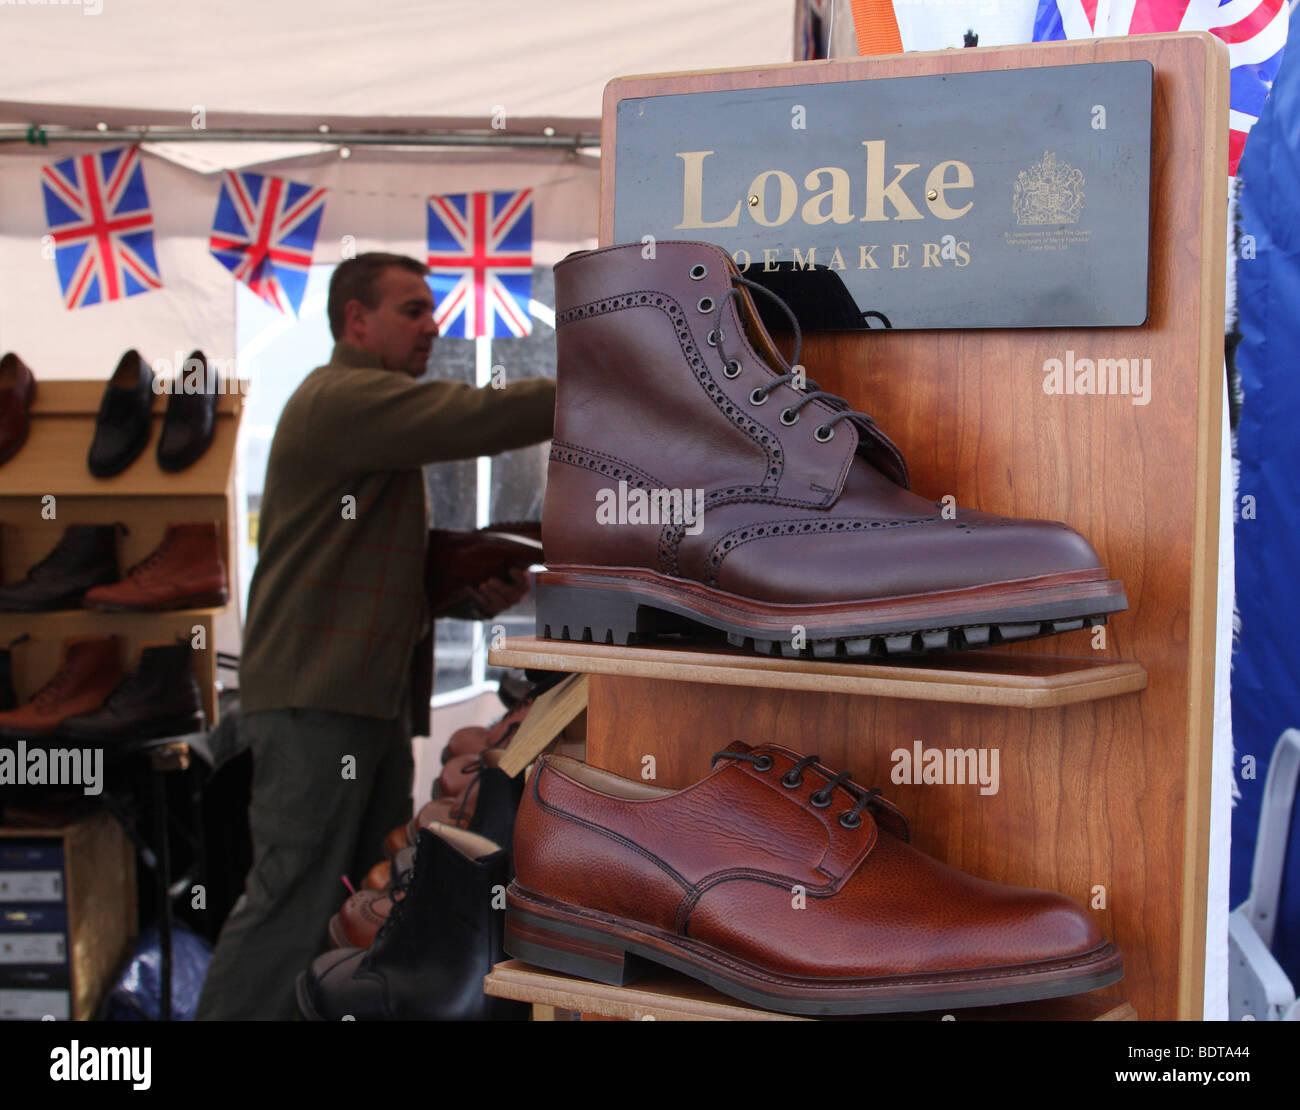 loake sale shoes